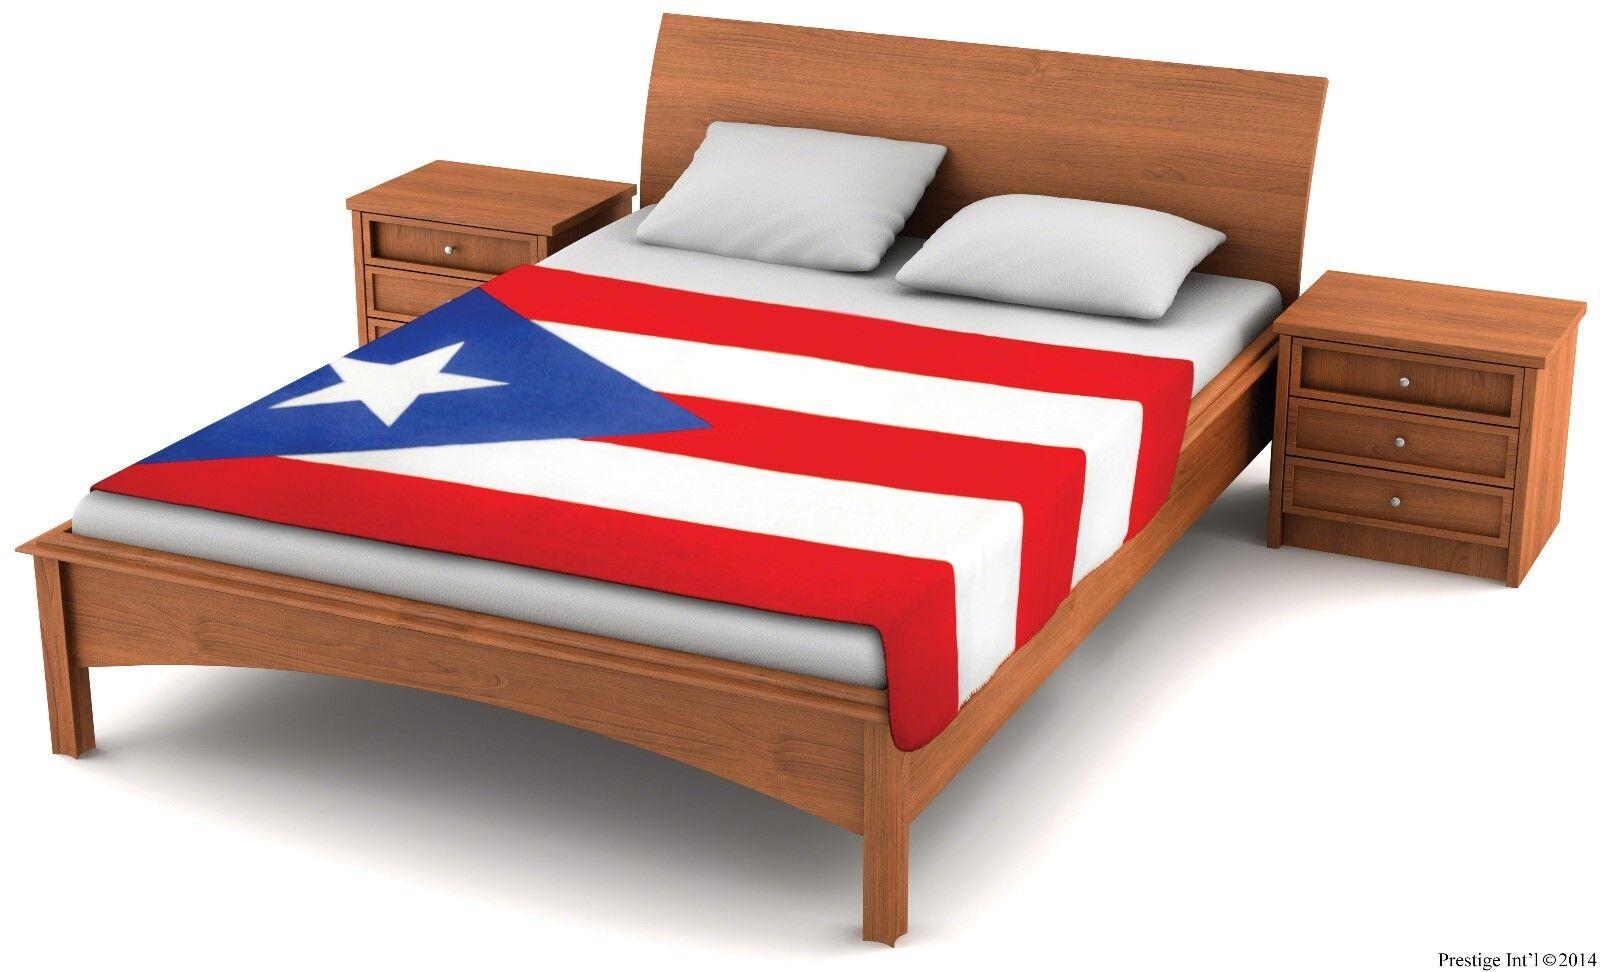 Fuzzy FlagsTM Fleece Puerto Rico Flag Blanket - 6.5 ft. x 4